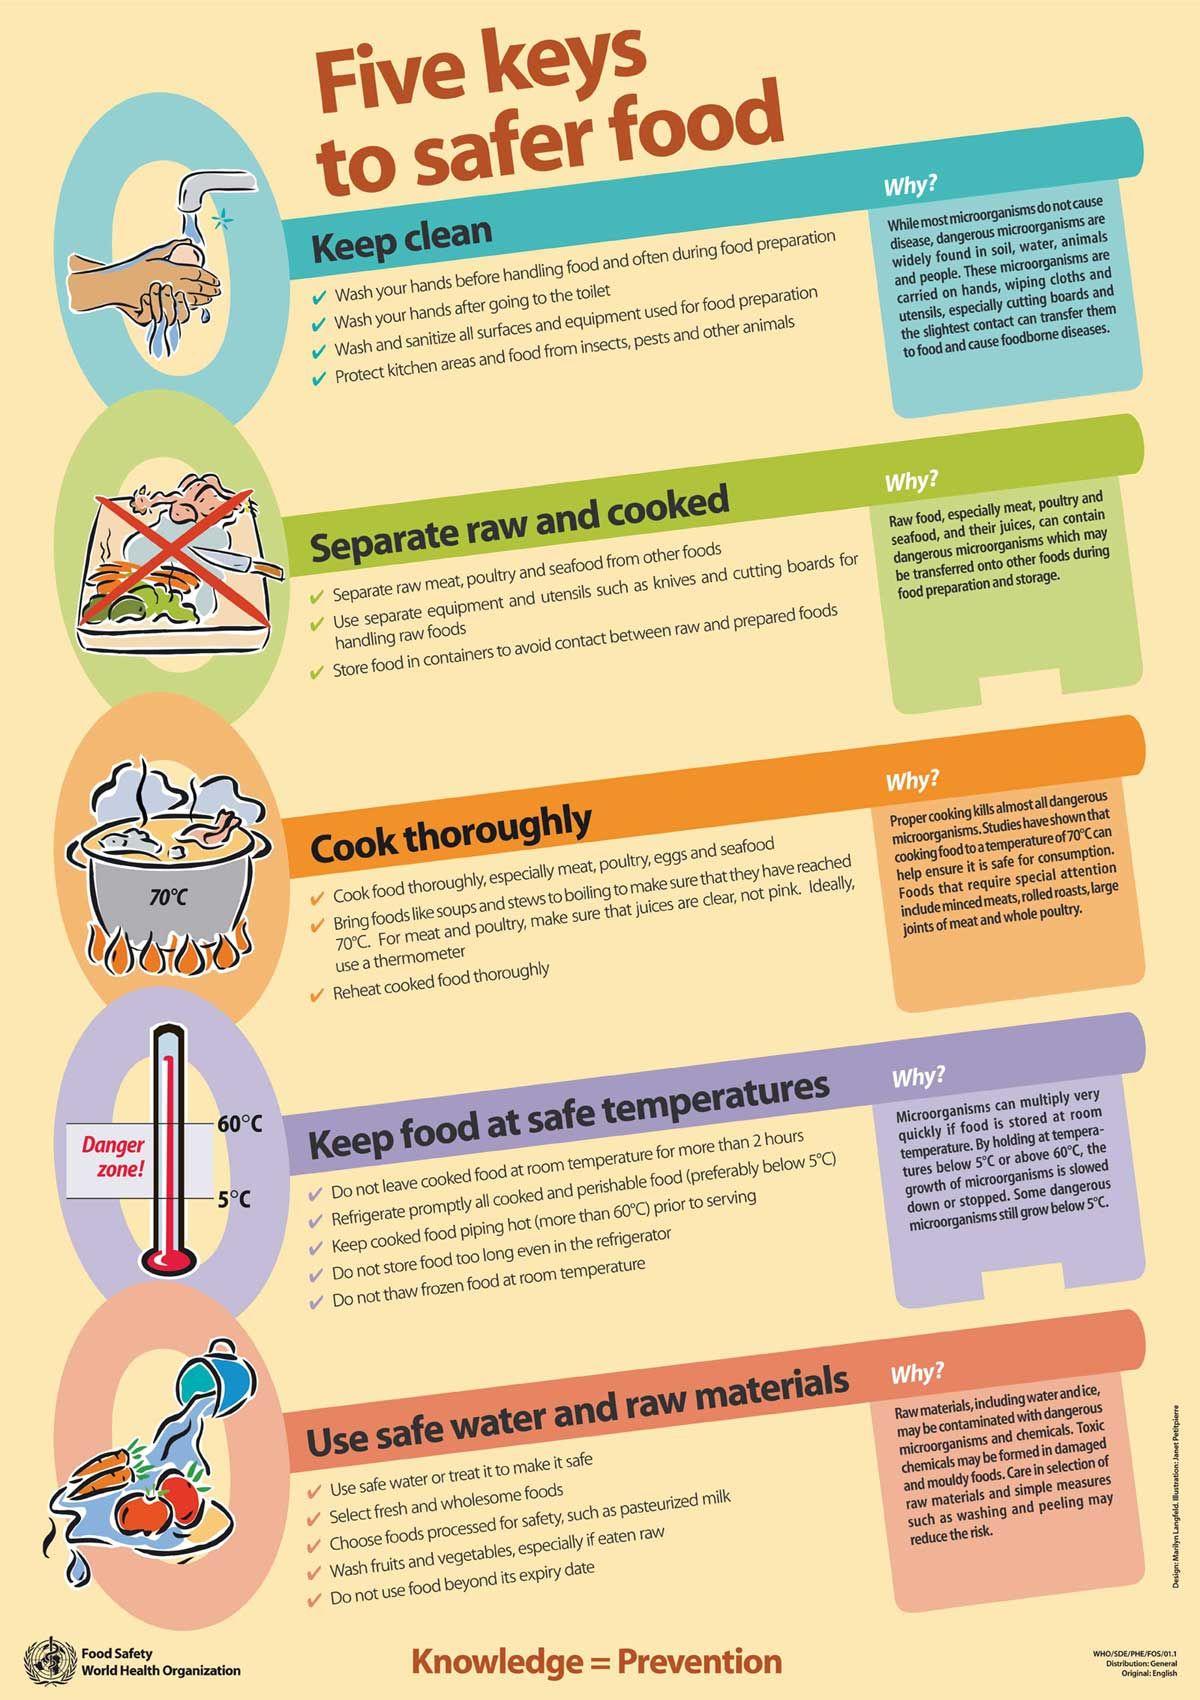 hygiene and safety in the kitchen poster Szukaj w Google